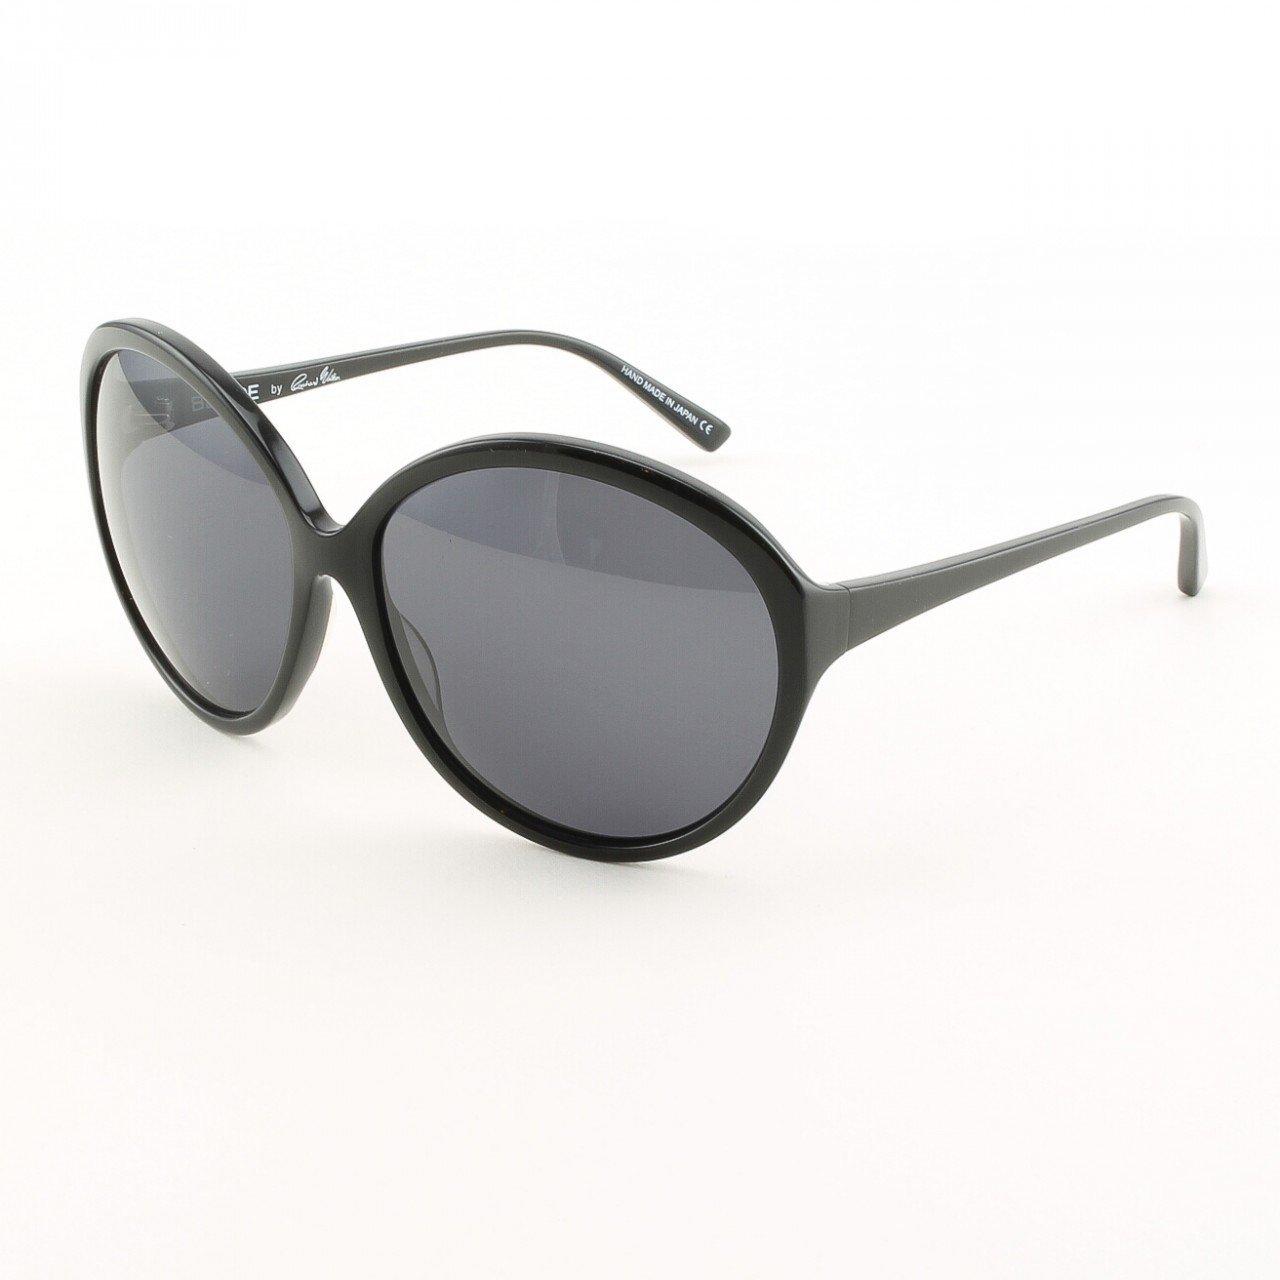 Blinde Way Hot Women's Sunglasses Col. Black with Black Lenses